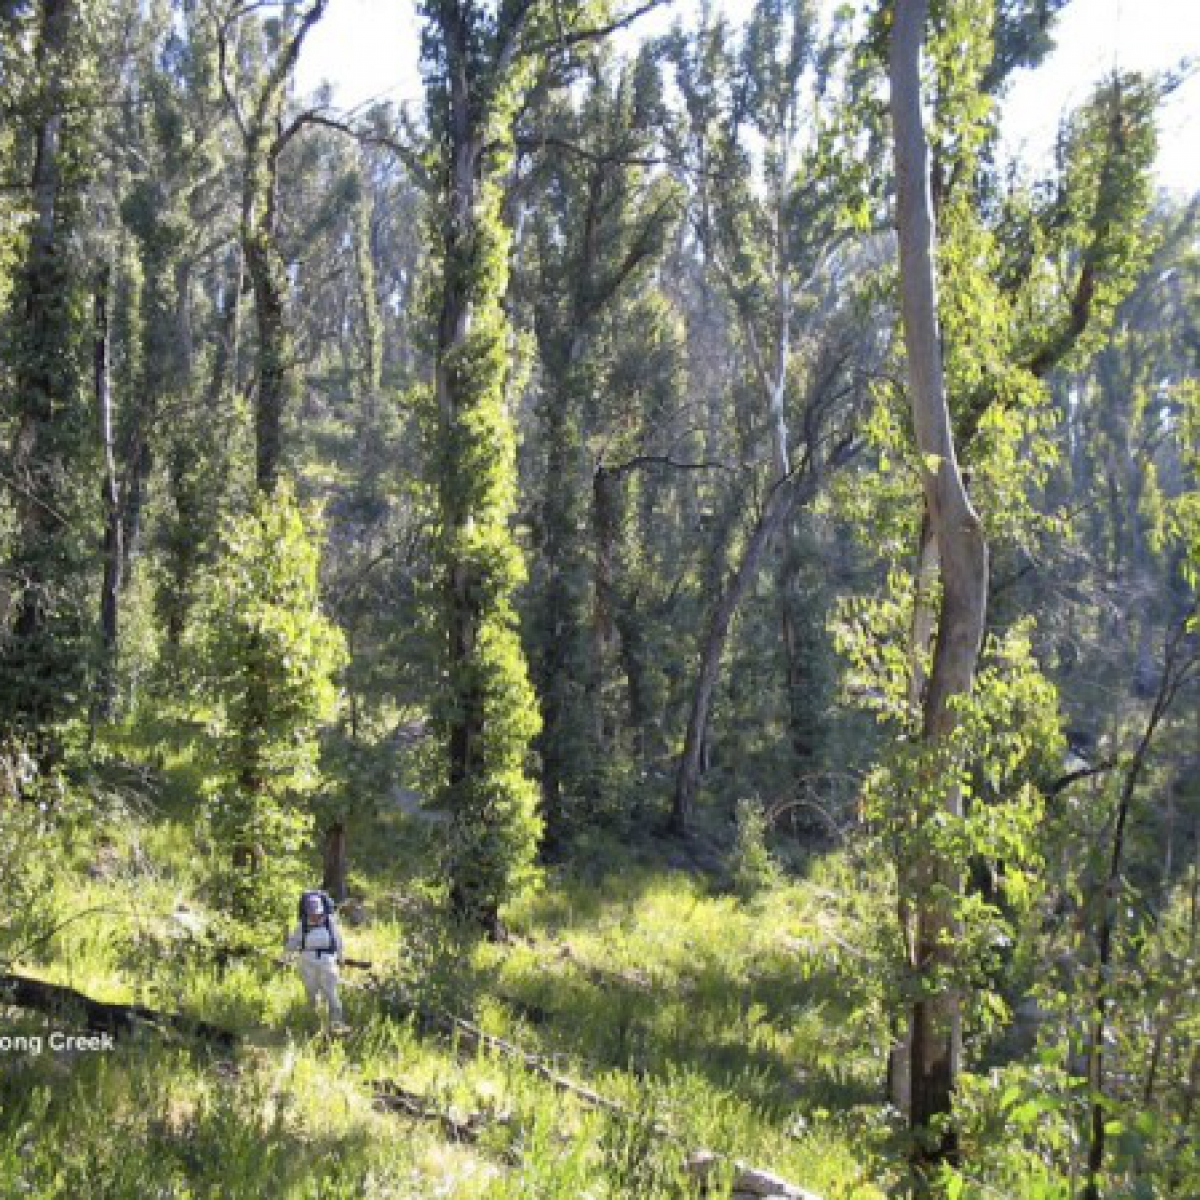 Judith on Bogong Creek - descending from Mt Gudgenby